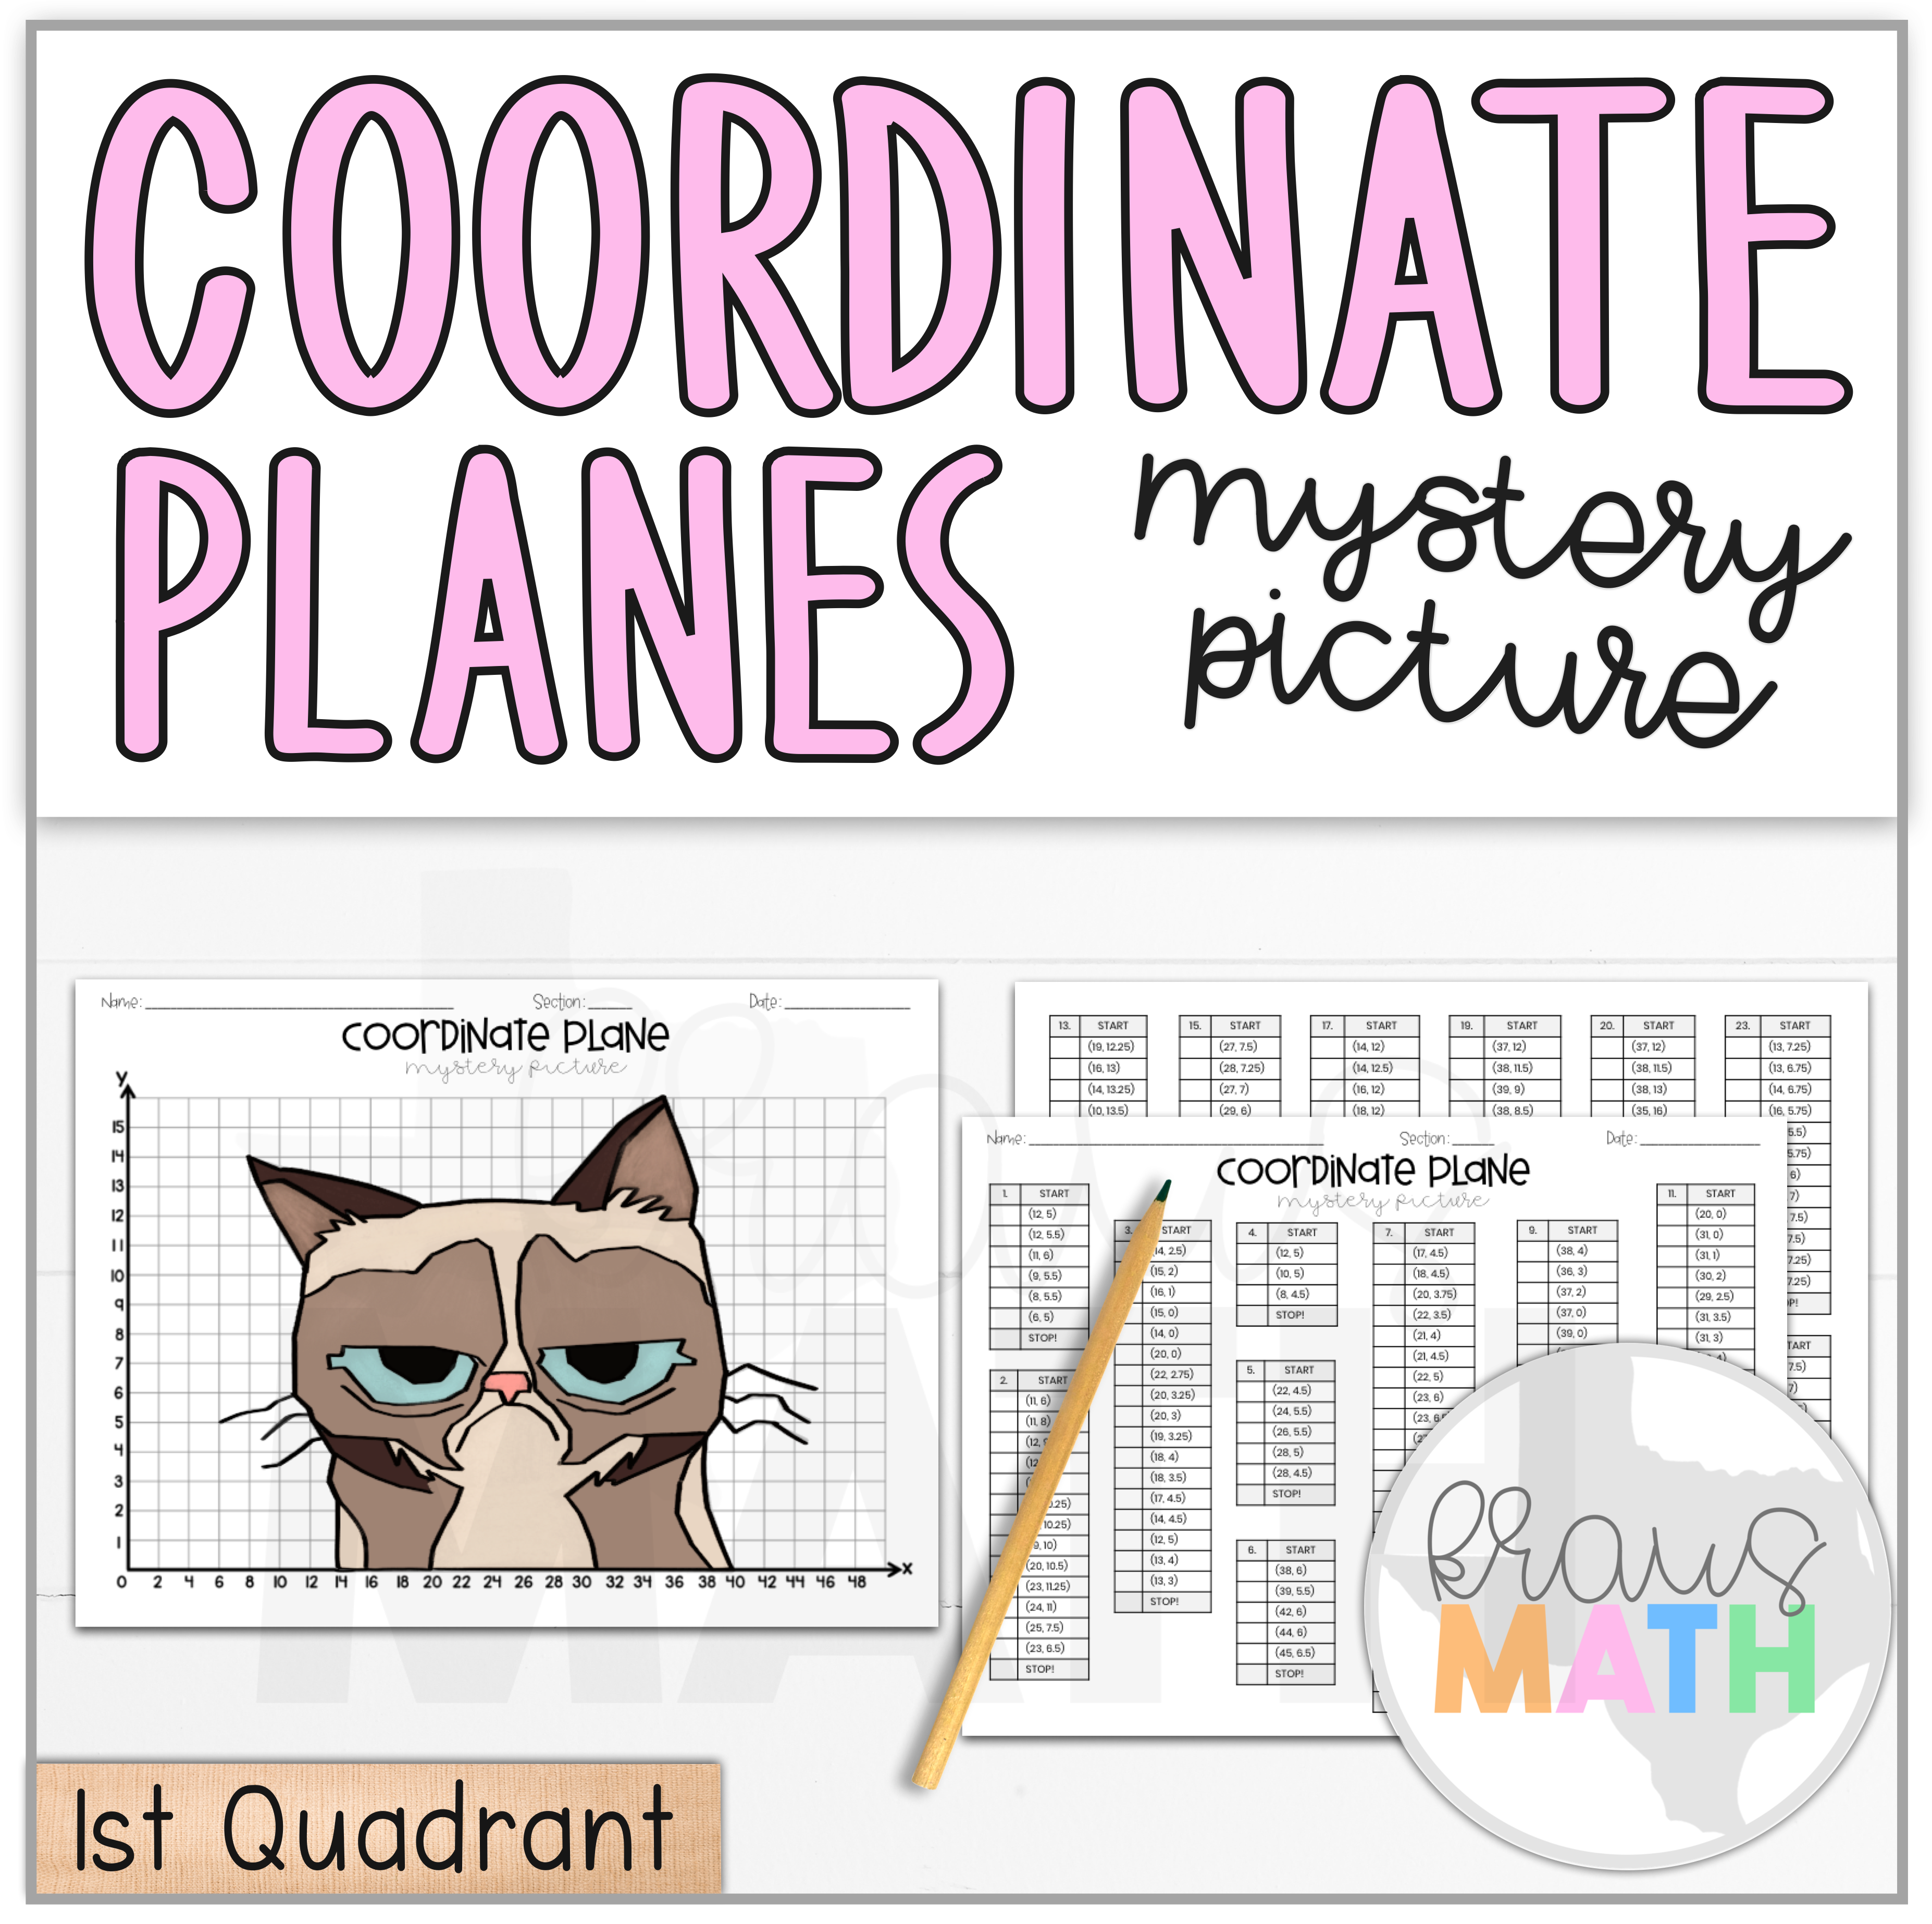 Grumpy Cat Coordinate Plane Mystery Picture 1st Quadrant